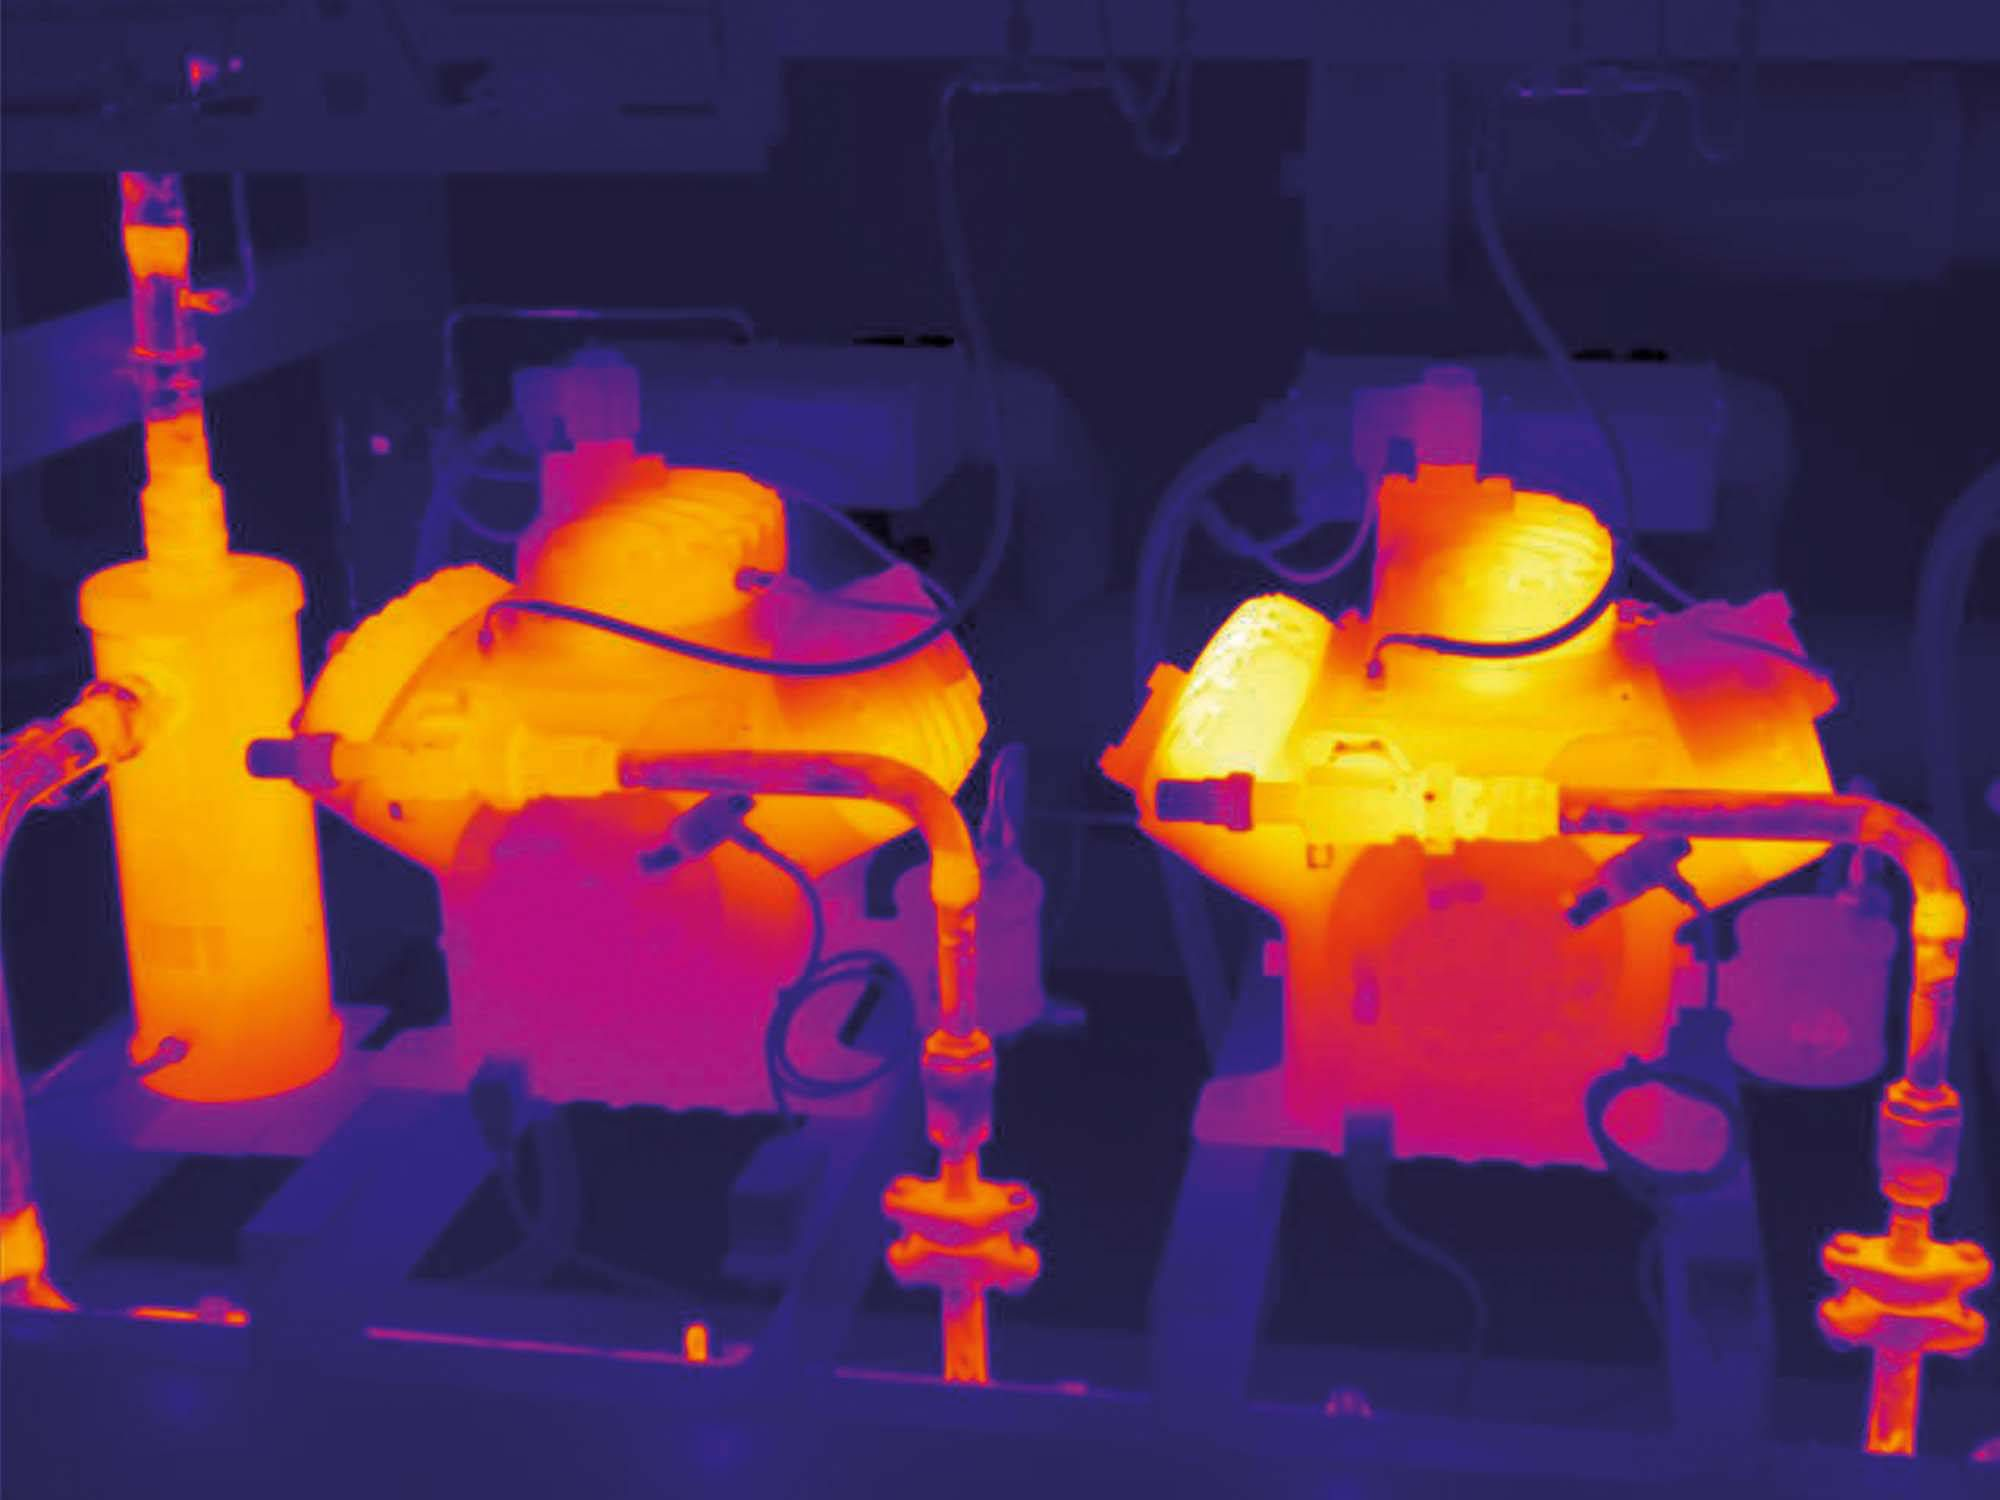 testo 868 - termografie inteligentă, interconectată